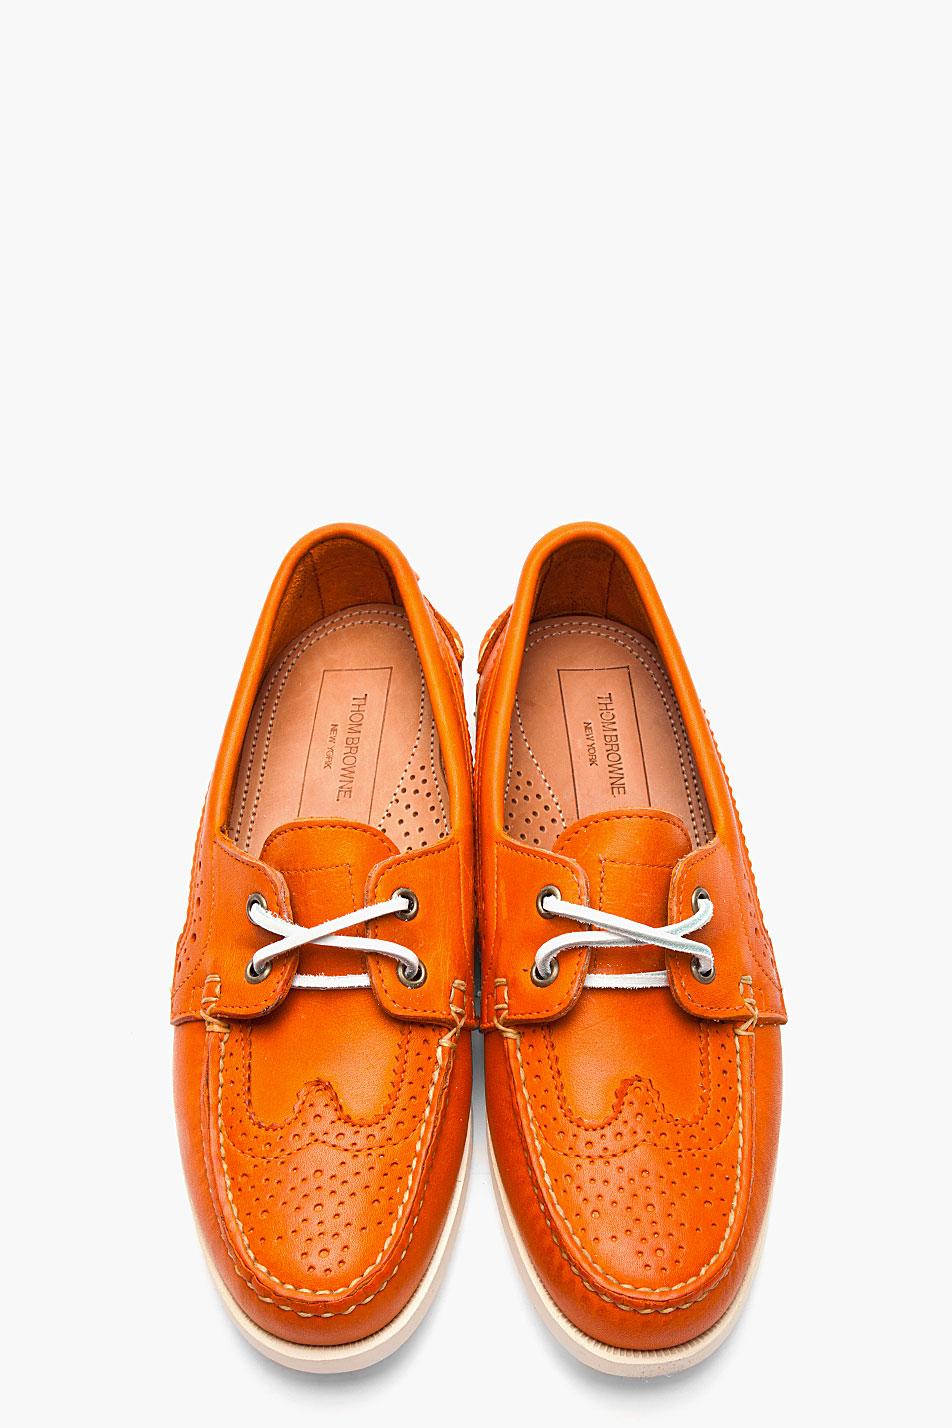 Perry Ellis White Orange Suede Shoes